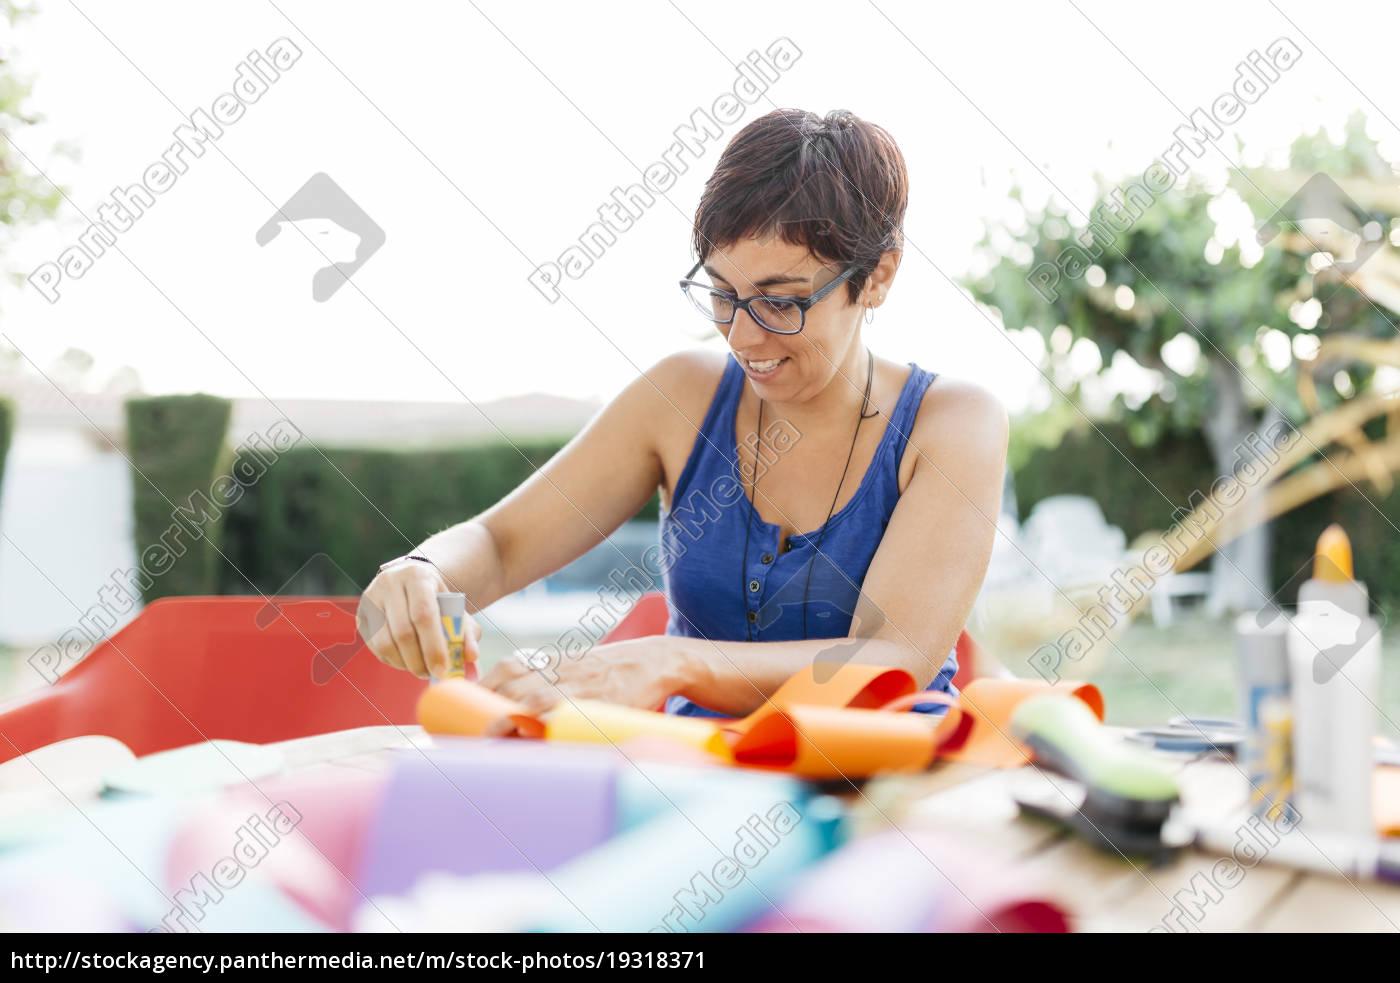 woman, doing, handicrafts, at, garden, table - 19318371